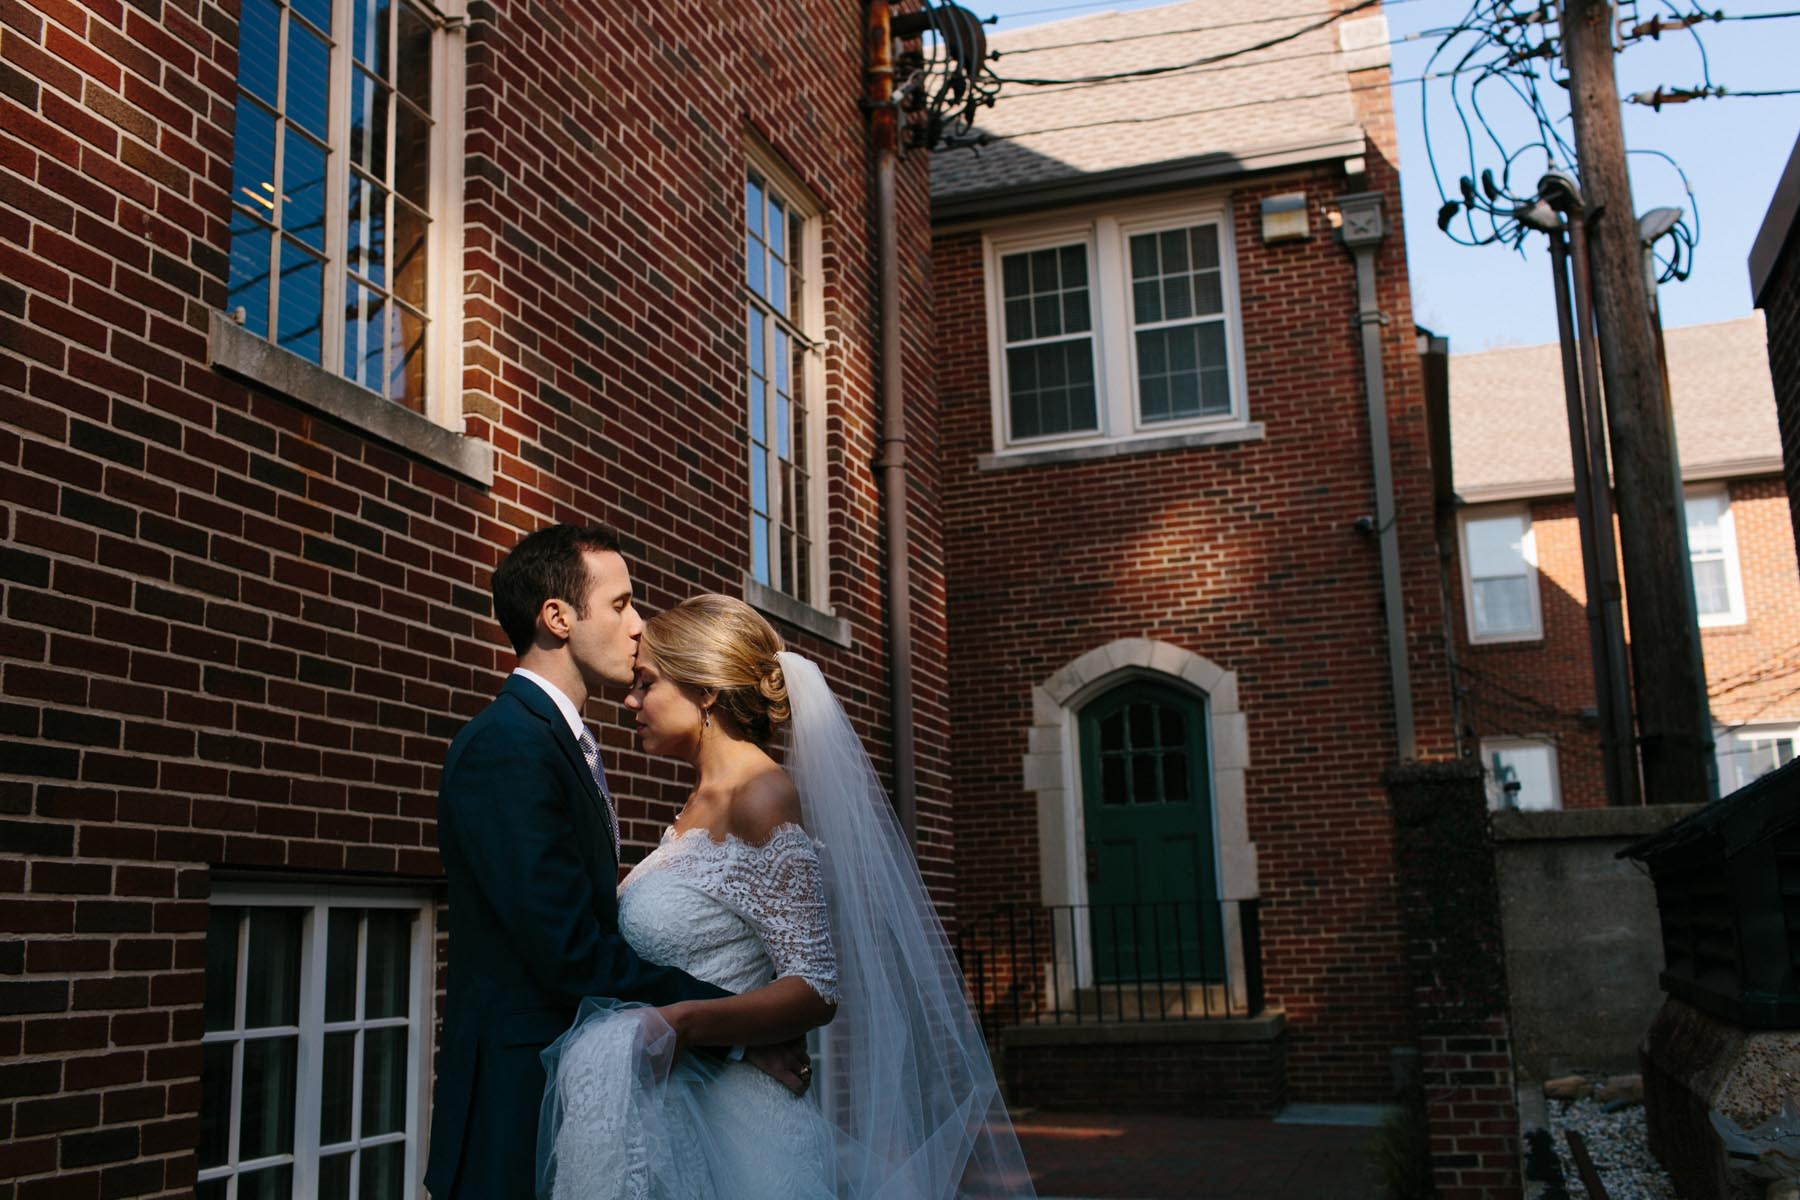 kjellman wedding blog biltmore wedding -64